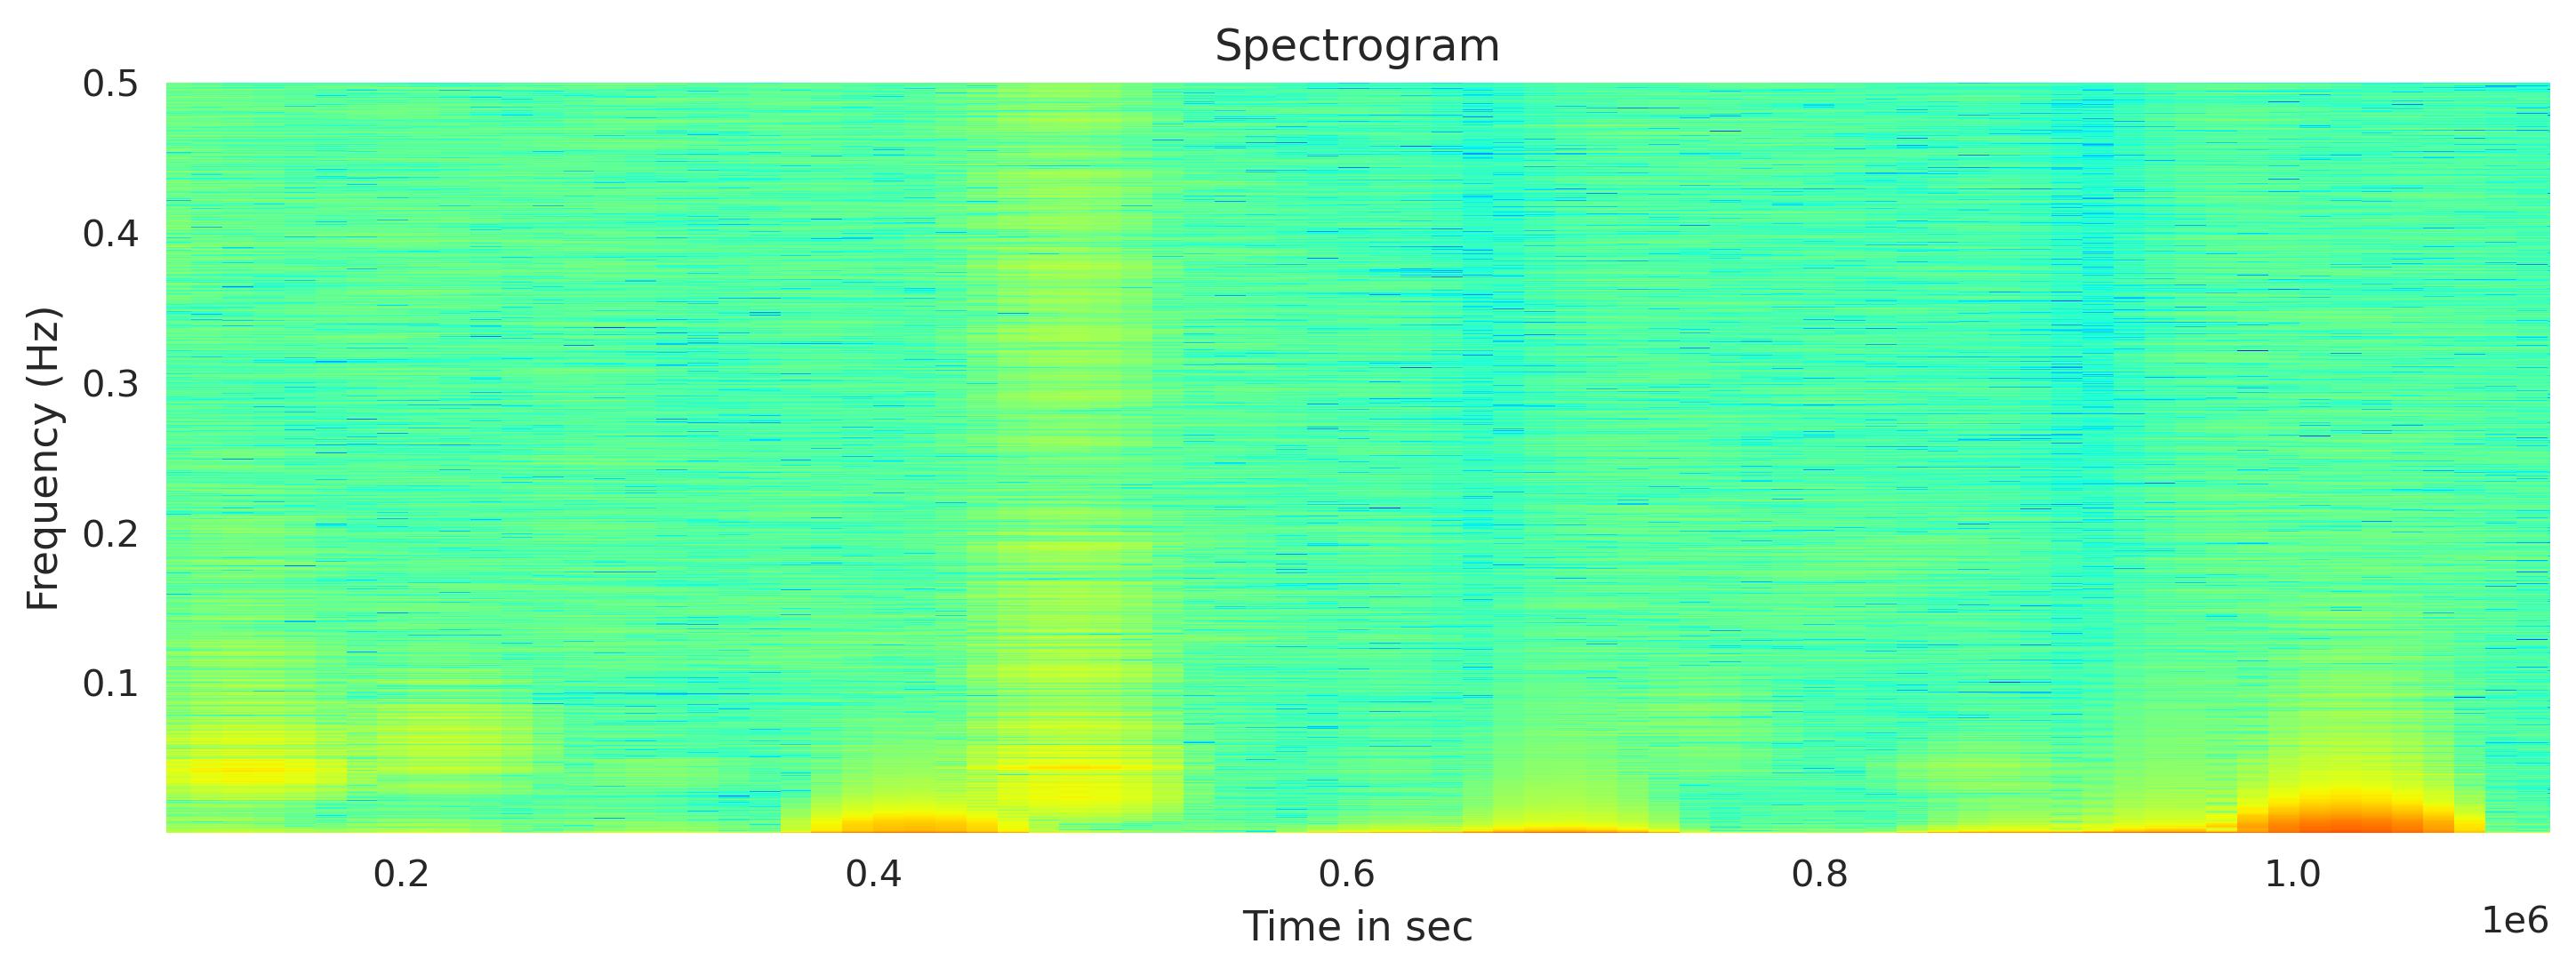 Spectrogram using Obspy